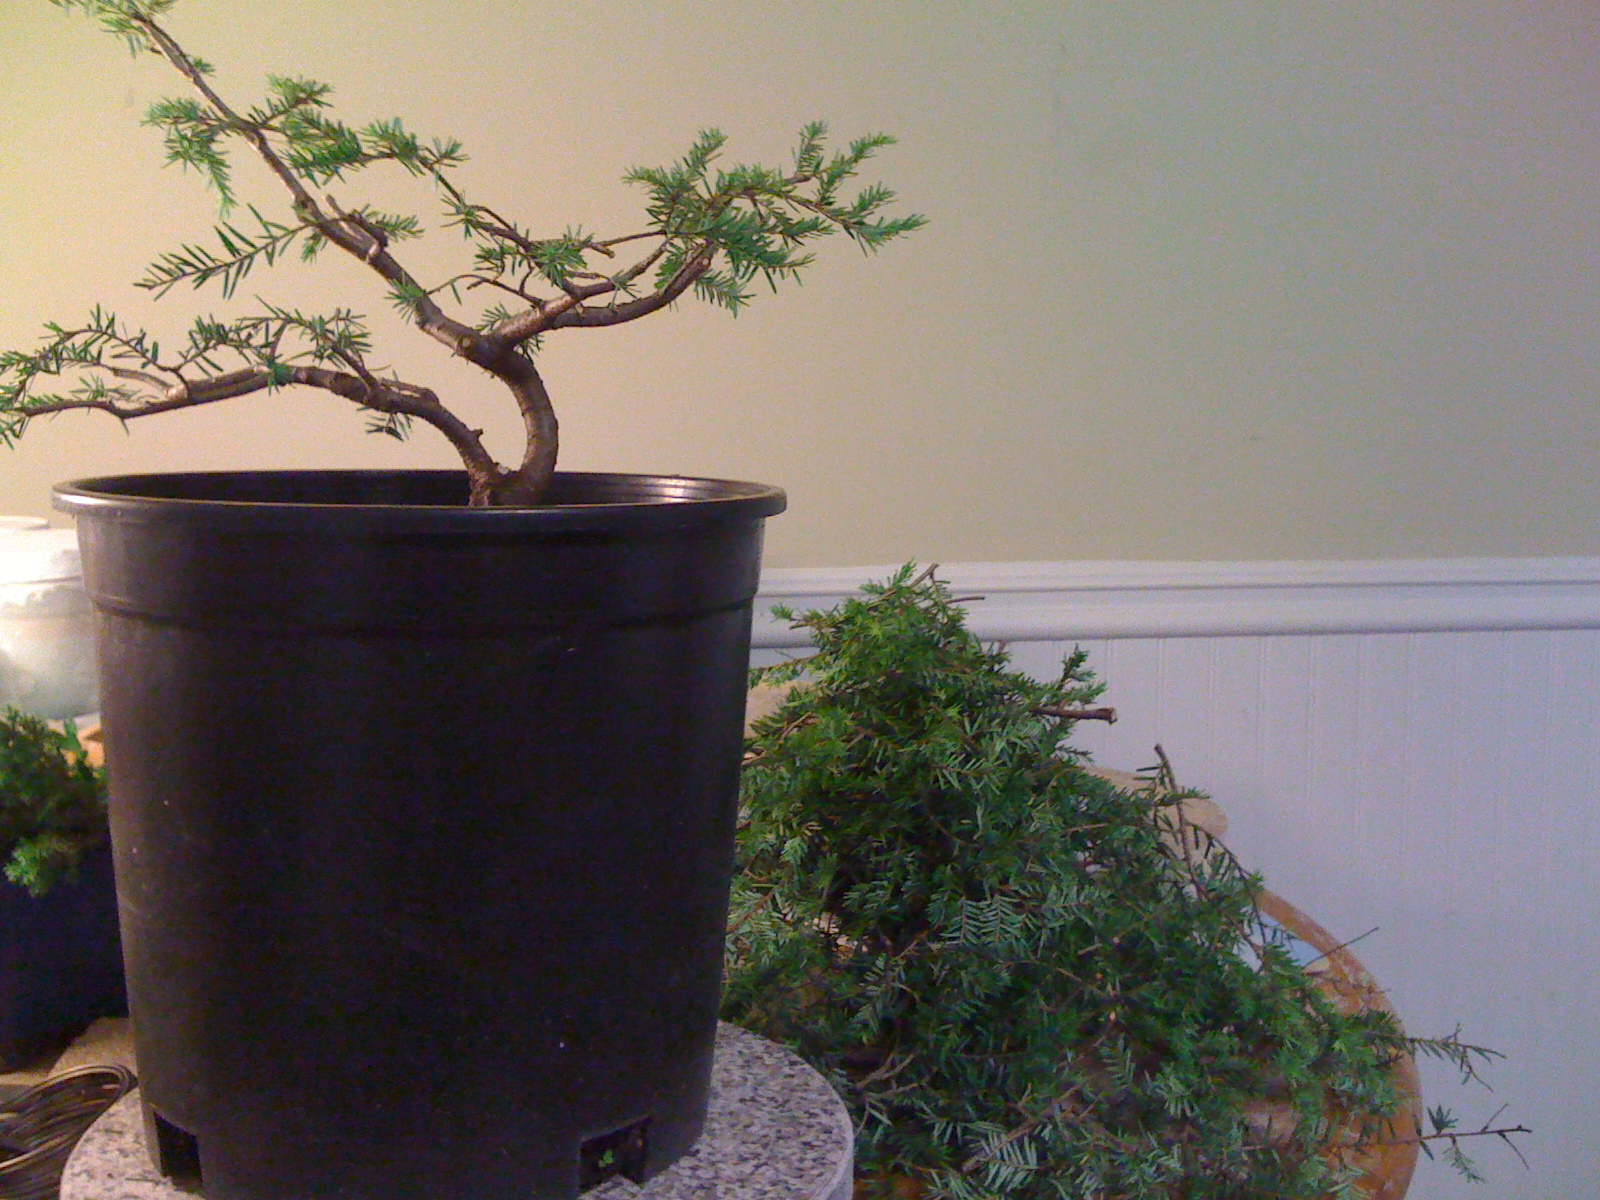 Bodhisattva Bonsai Canadian Hemlock Bonsai Takes Form